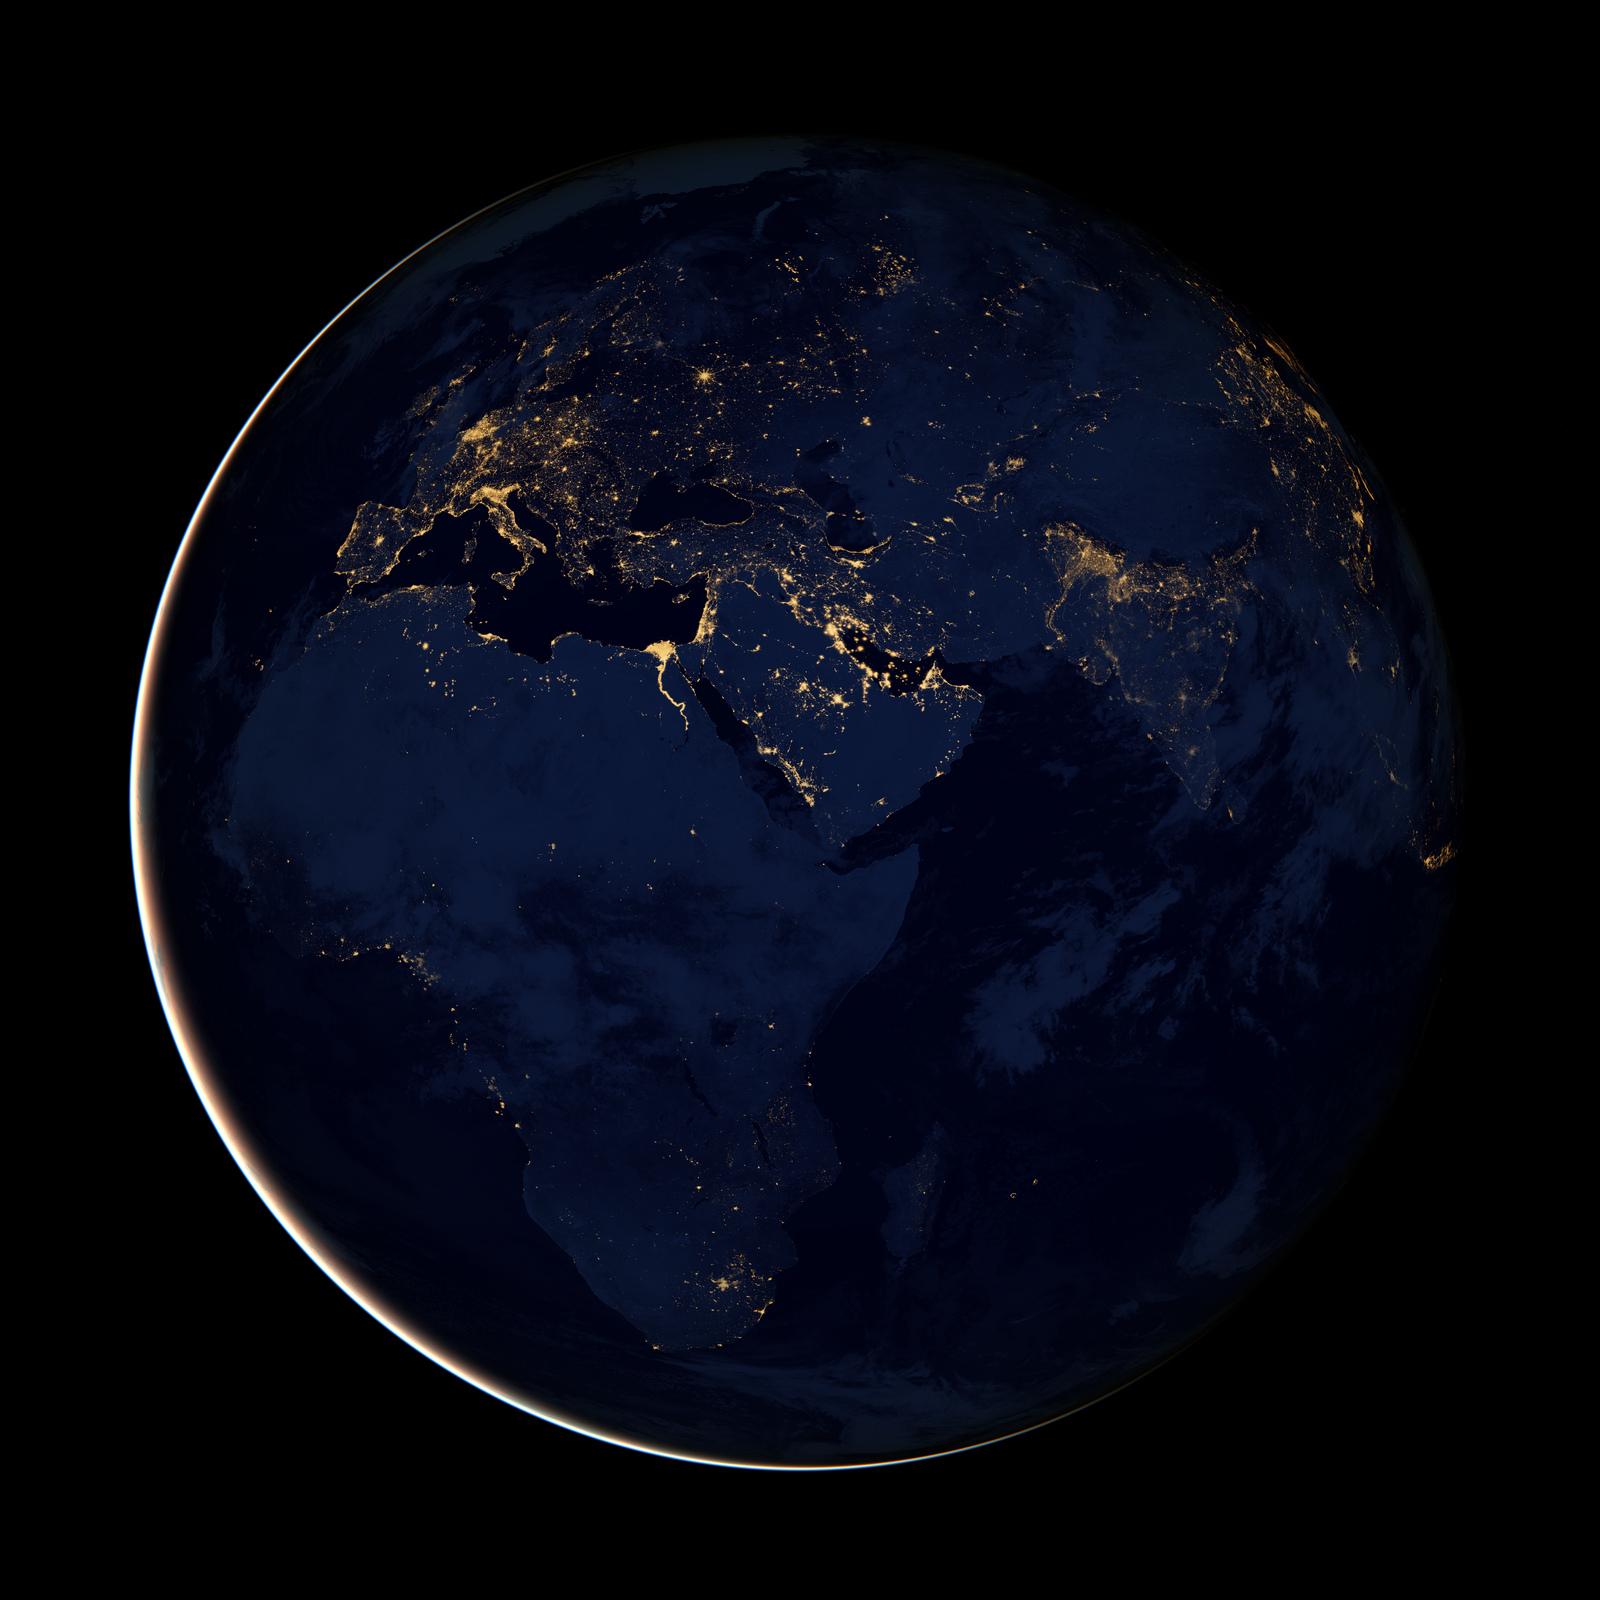 nasa night lights - HD1024×1024